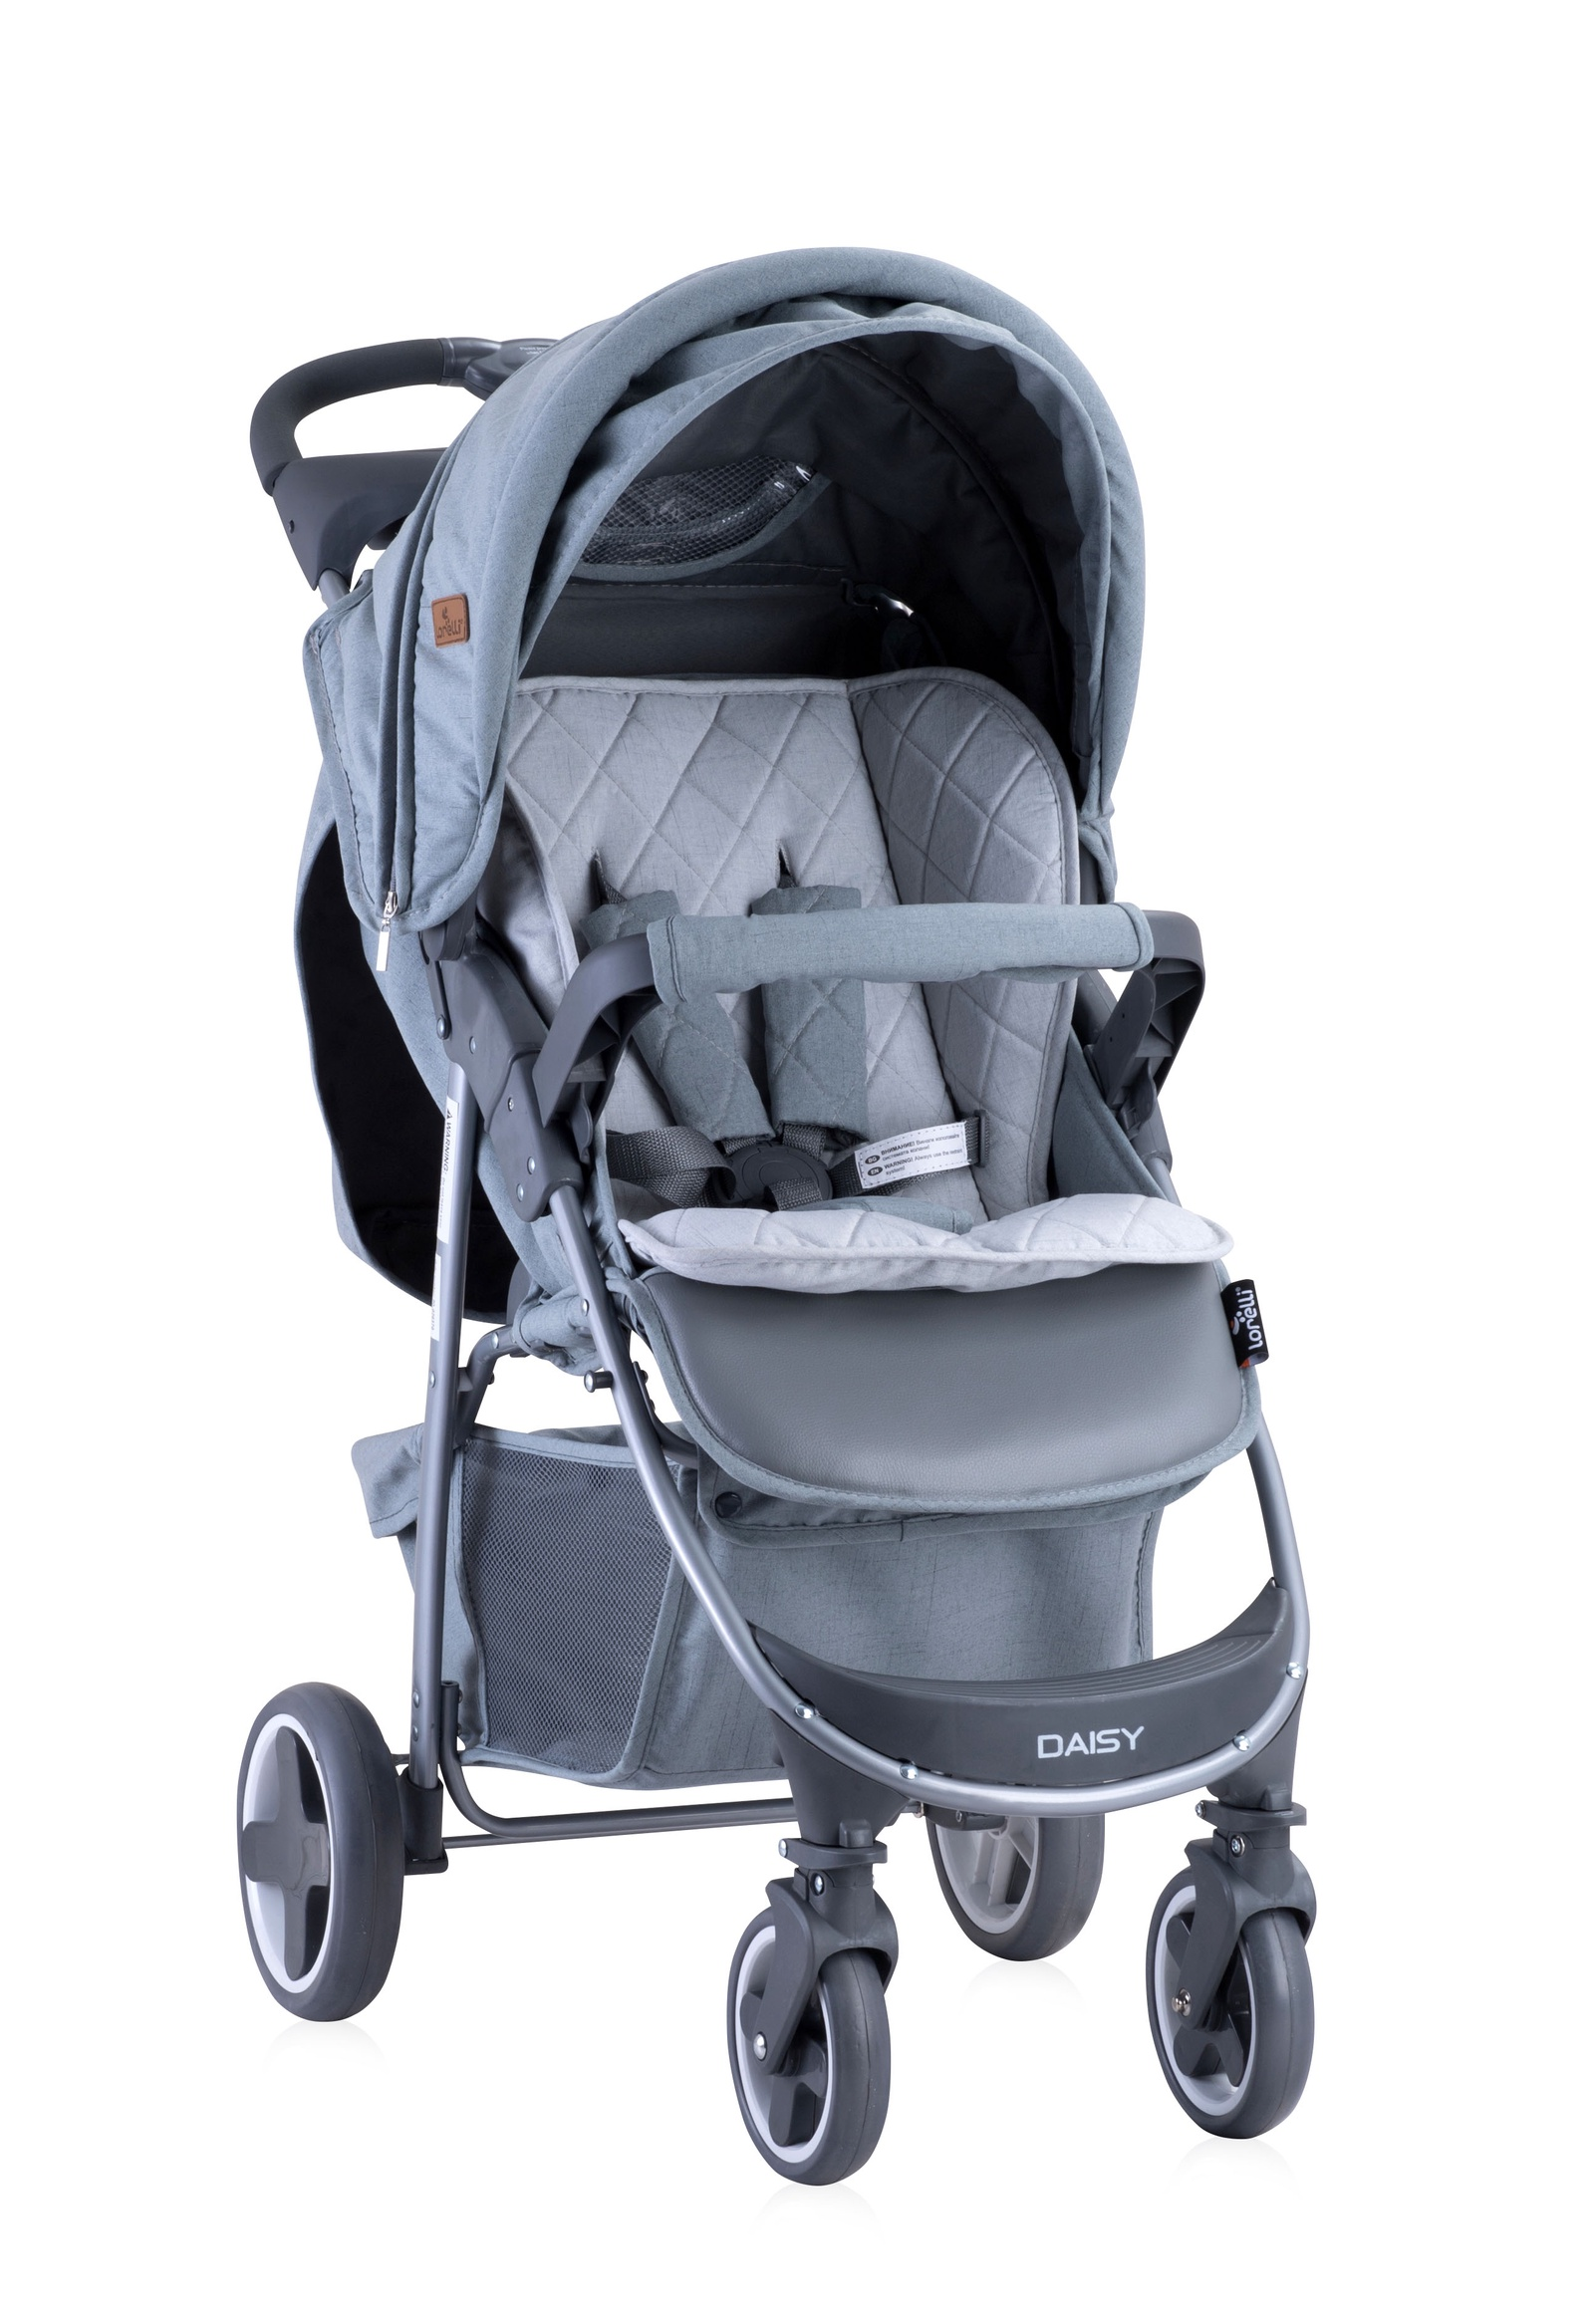 Прогулочная коляска Lorelli Daisy с накидкой на ножки цвет серый, Grey